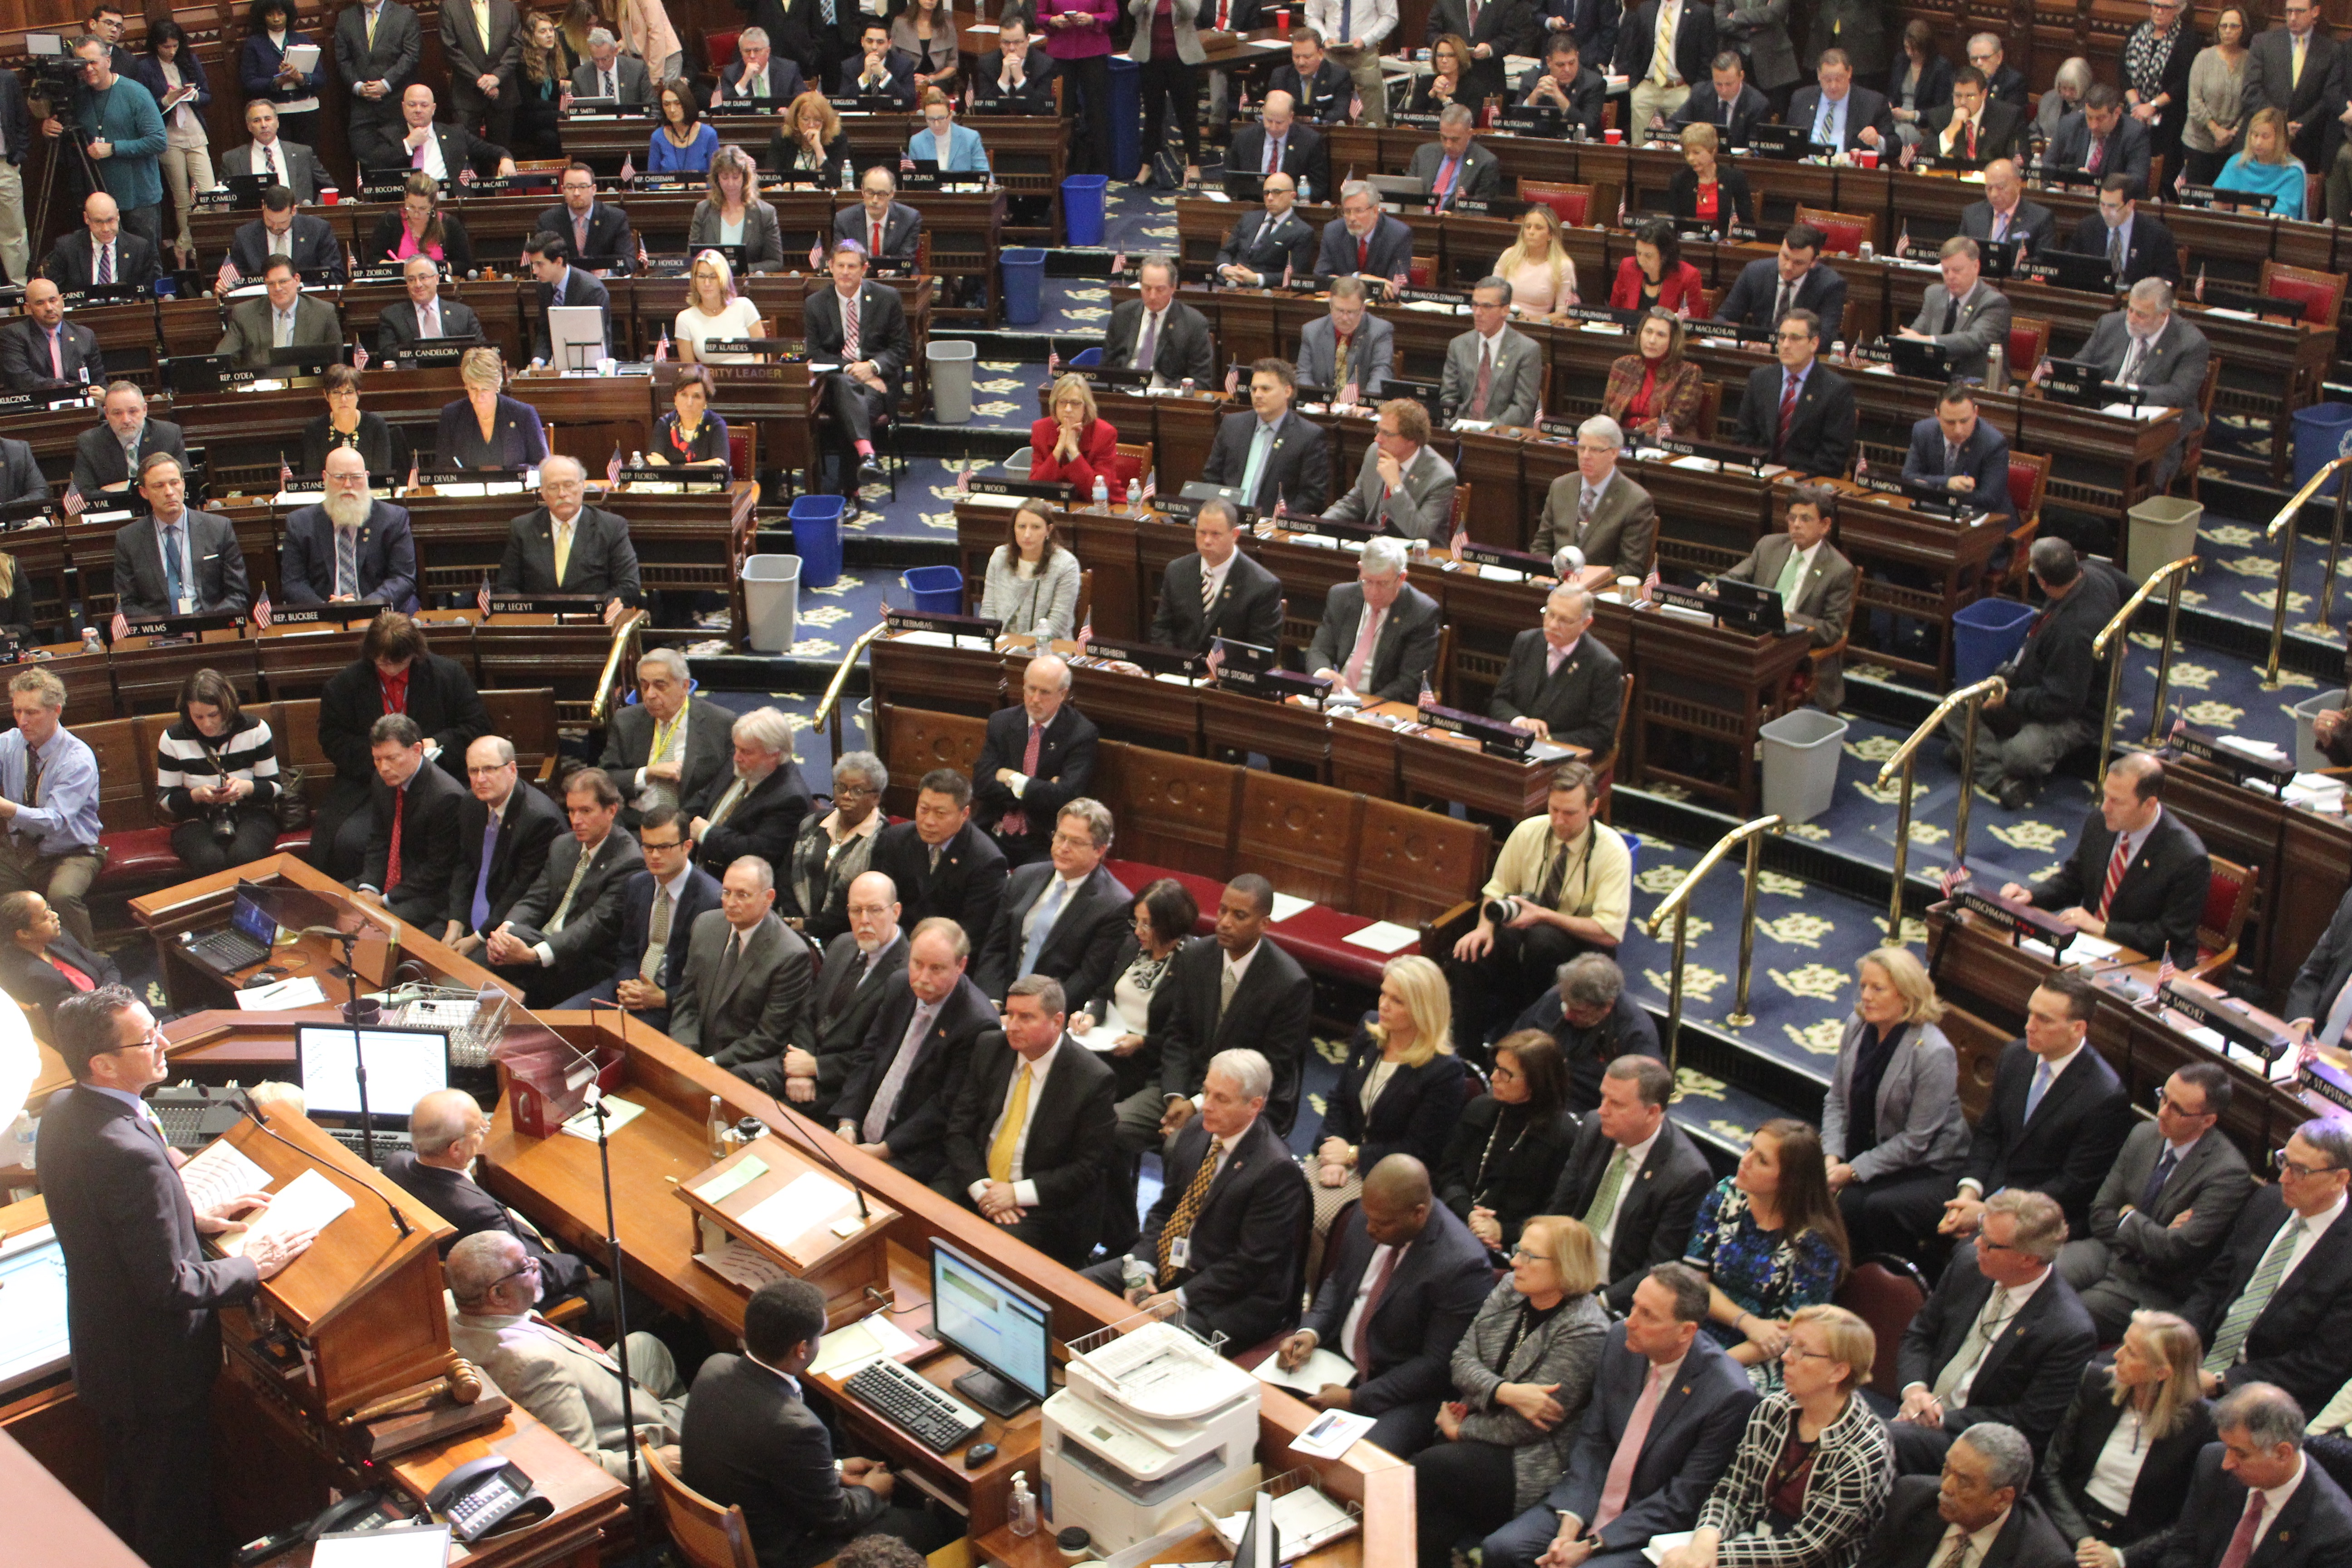 Malloy budget hinges on big labor savings, new revenues